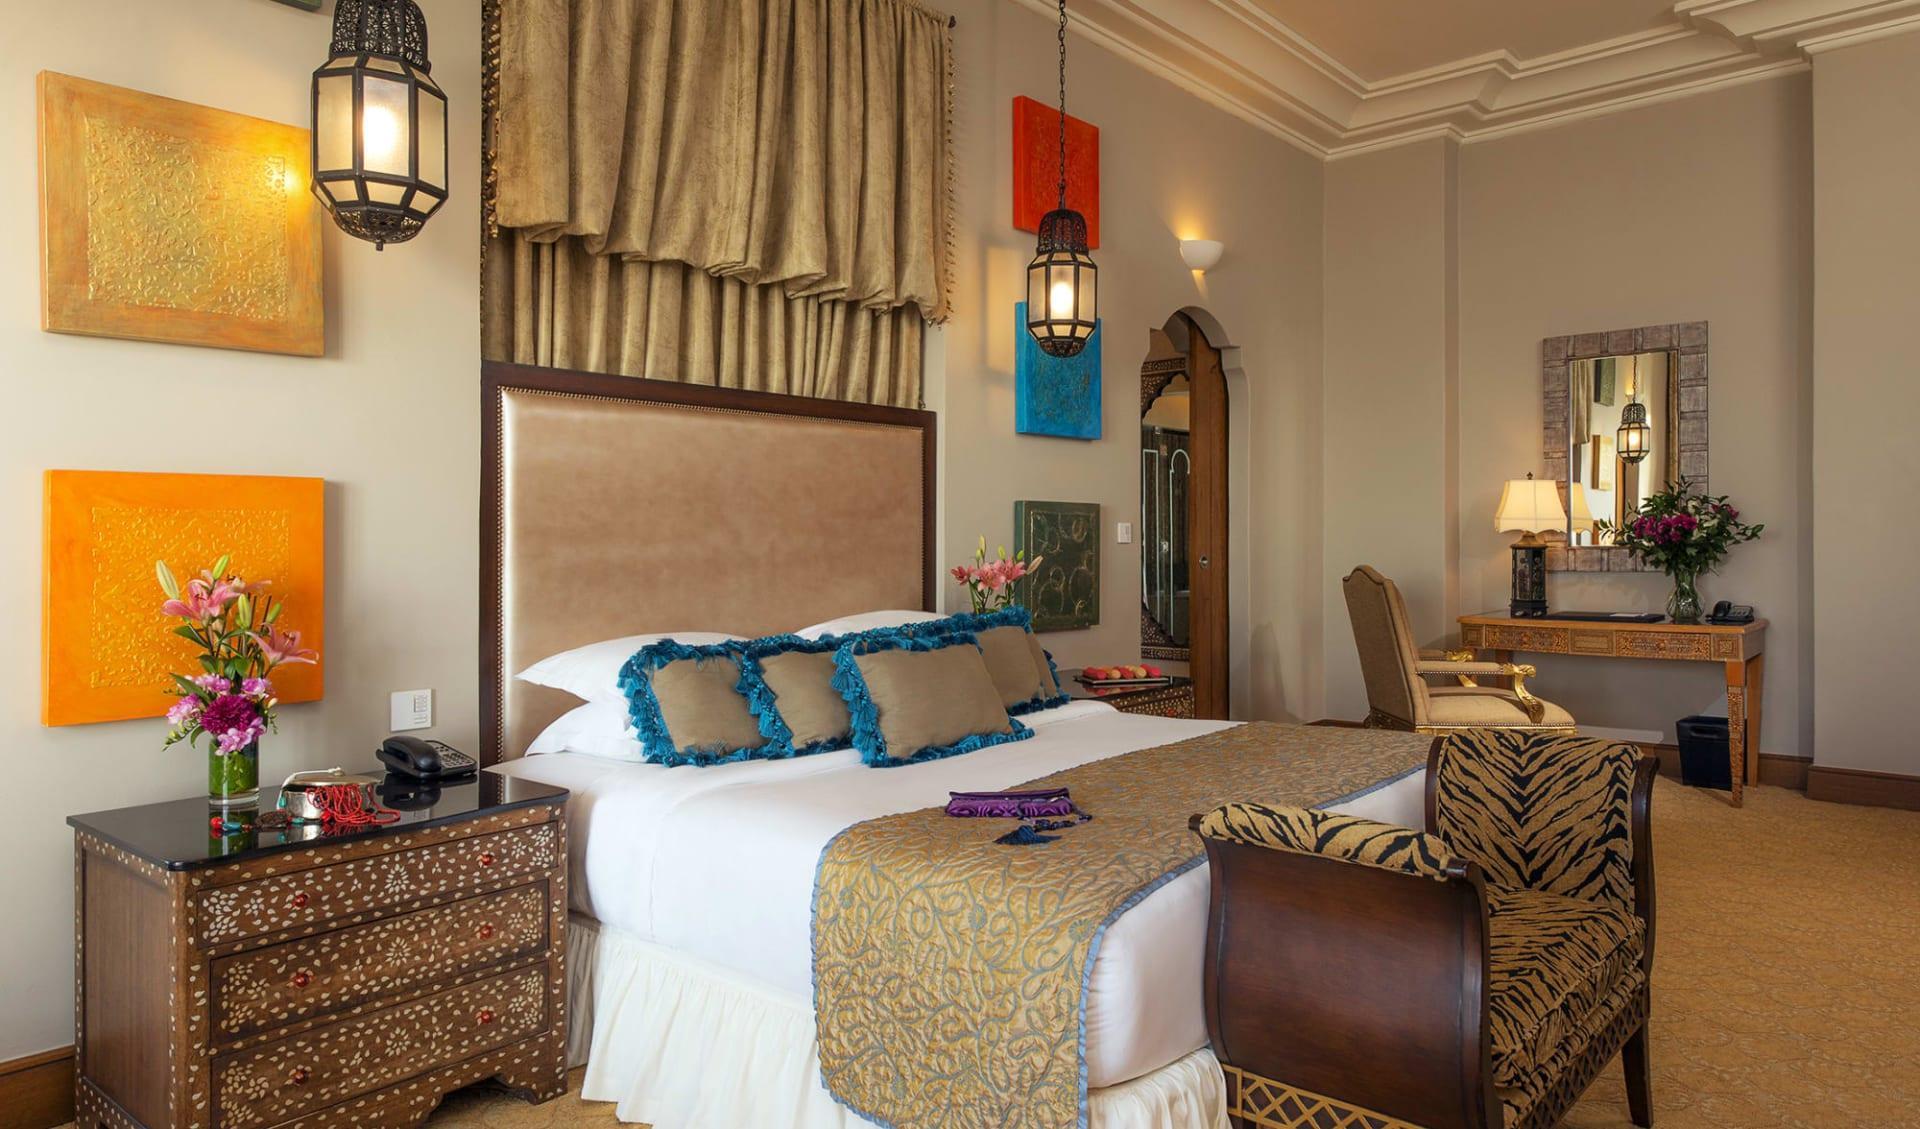 Mazagan Beach & Golf Resort in El Jadida:  Mazagan Beach & Golf Resort - Royal Suite